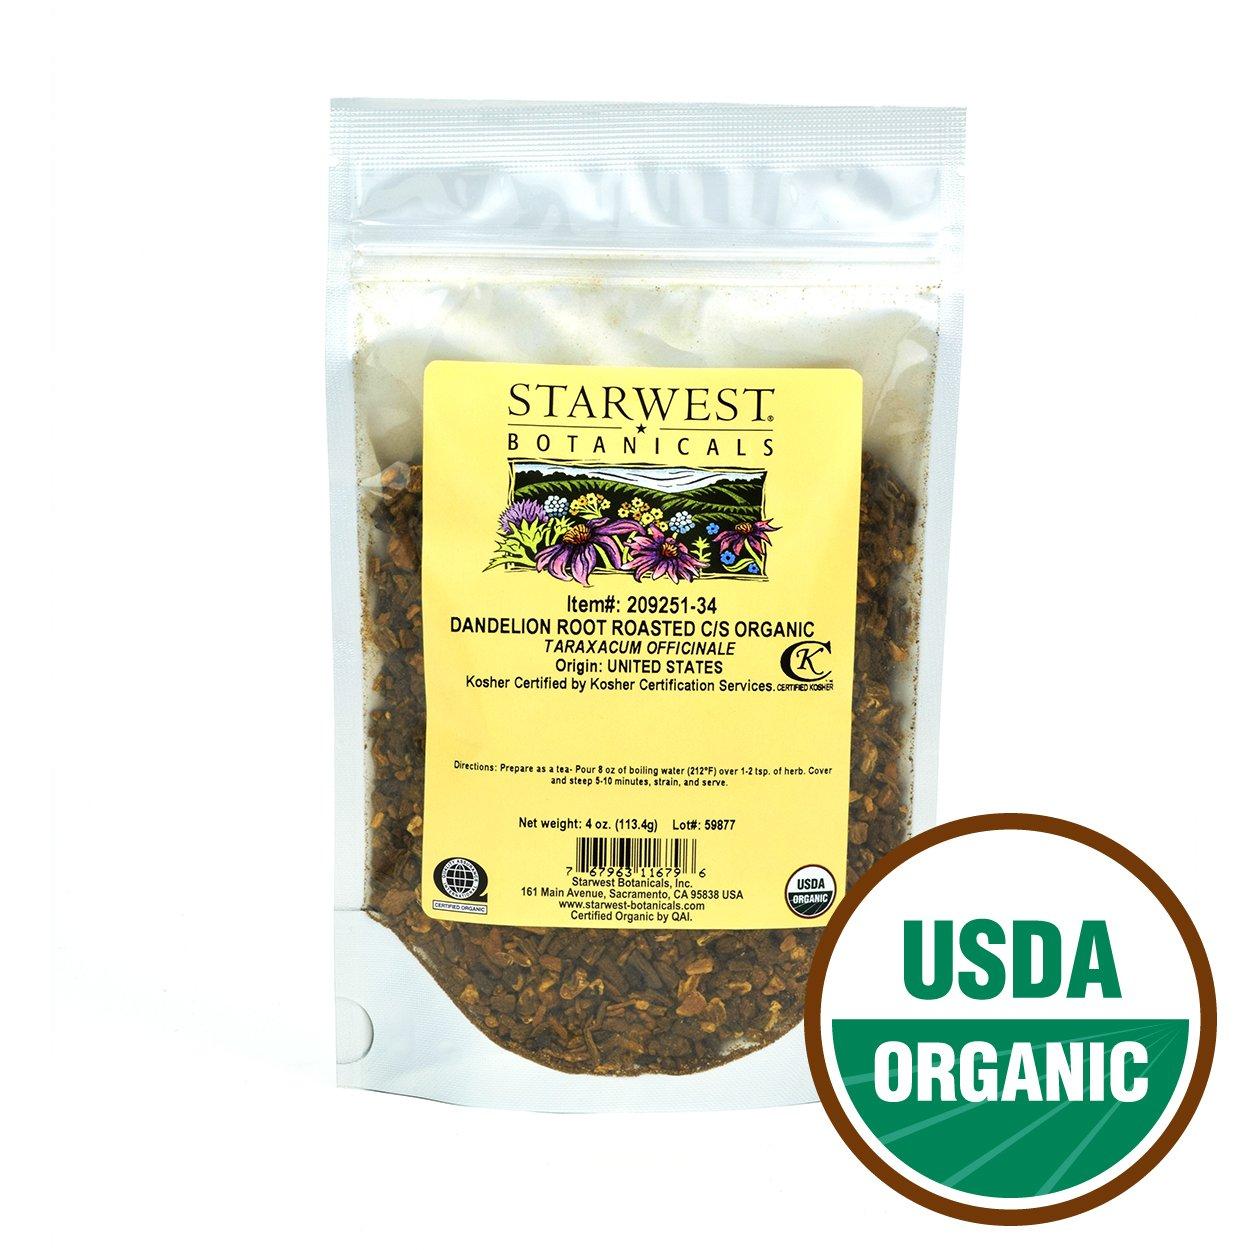 Starwest Botanicals Organic Dandelion Root Roasted Cut [4 Ounces] Loose Tea in Bulk